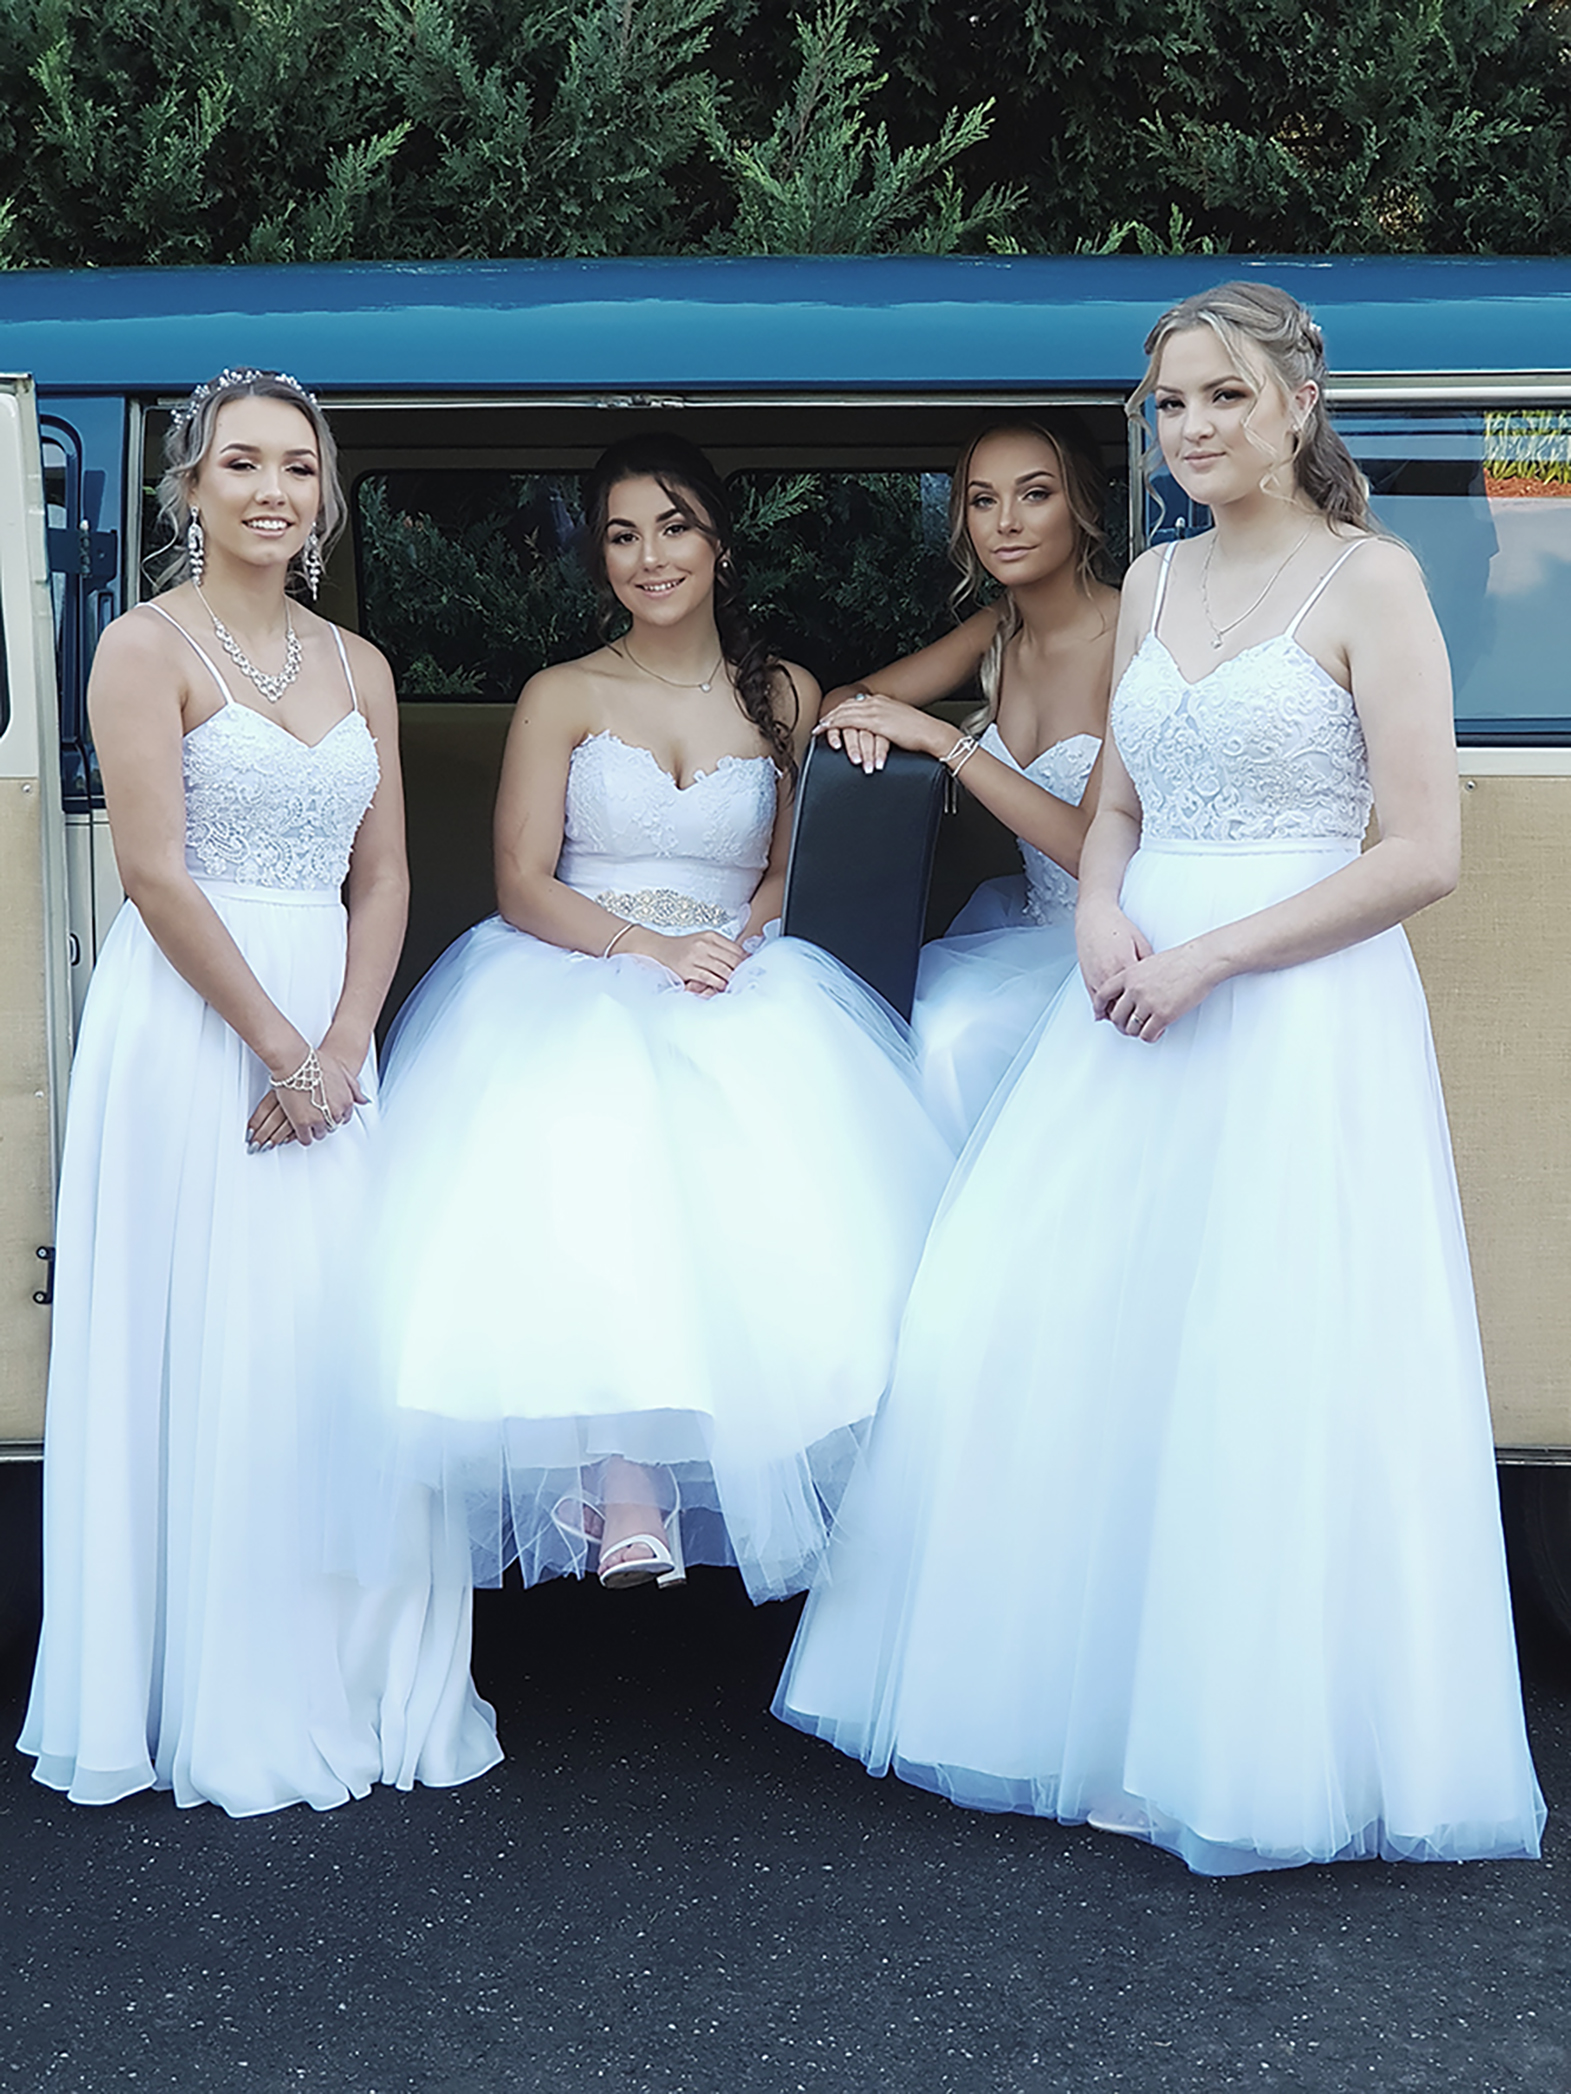 Casey Grammer Debutante Ball - Photo's by Kombi & Beetle Wedding & Debutante Car Hire (28)